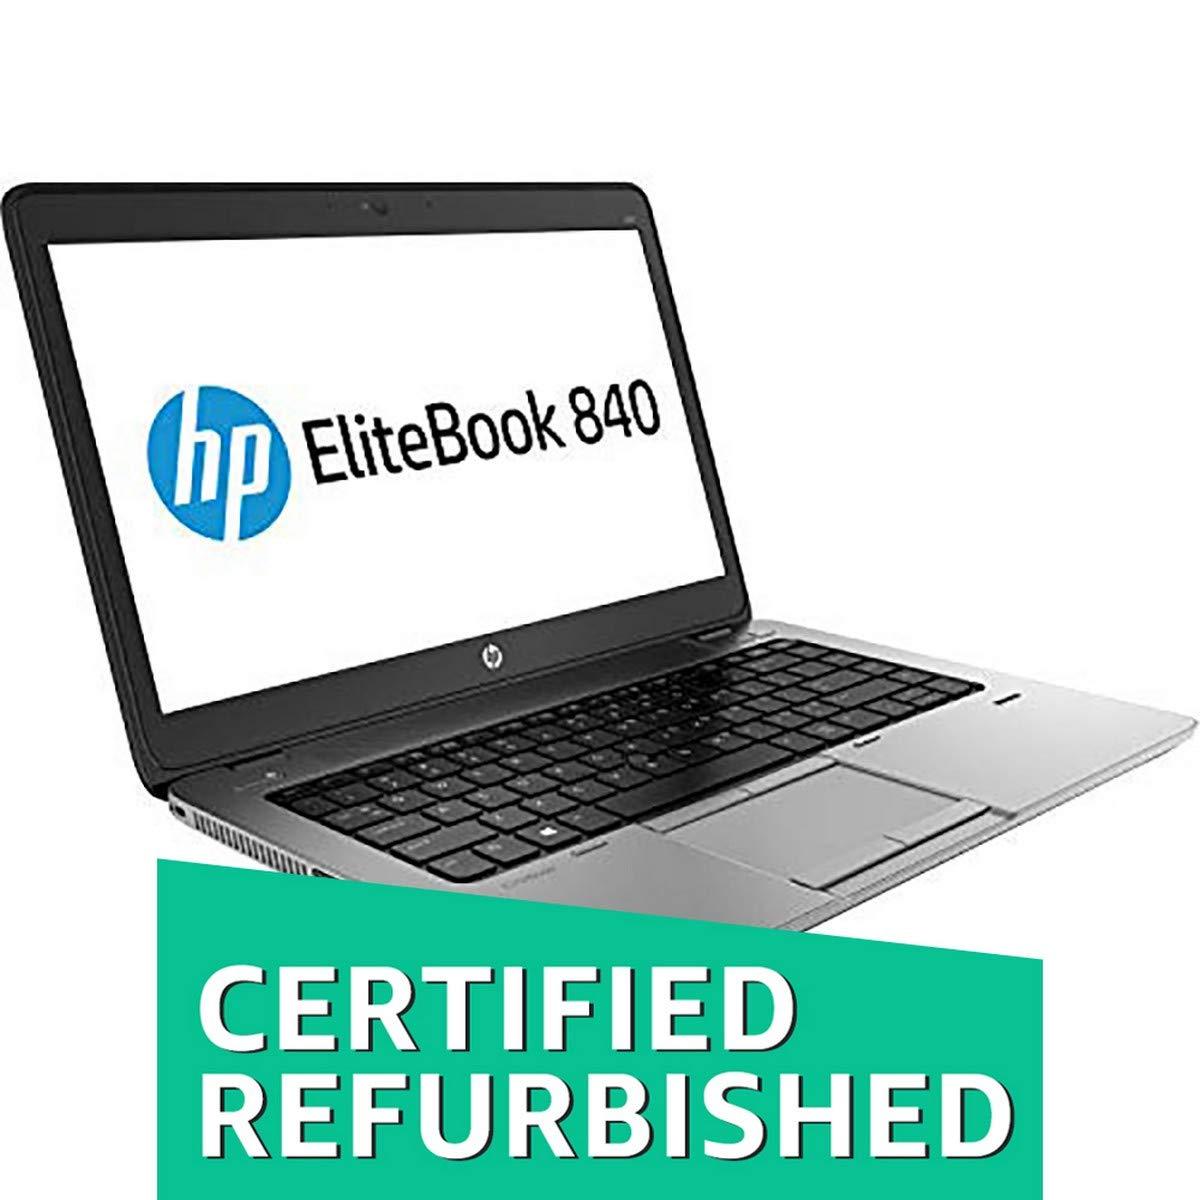 (Certified REFURBISHED) HP Ultrabook 840G1-2 GB-128 GB